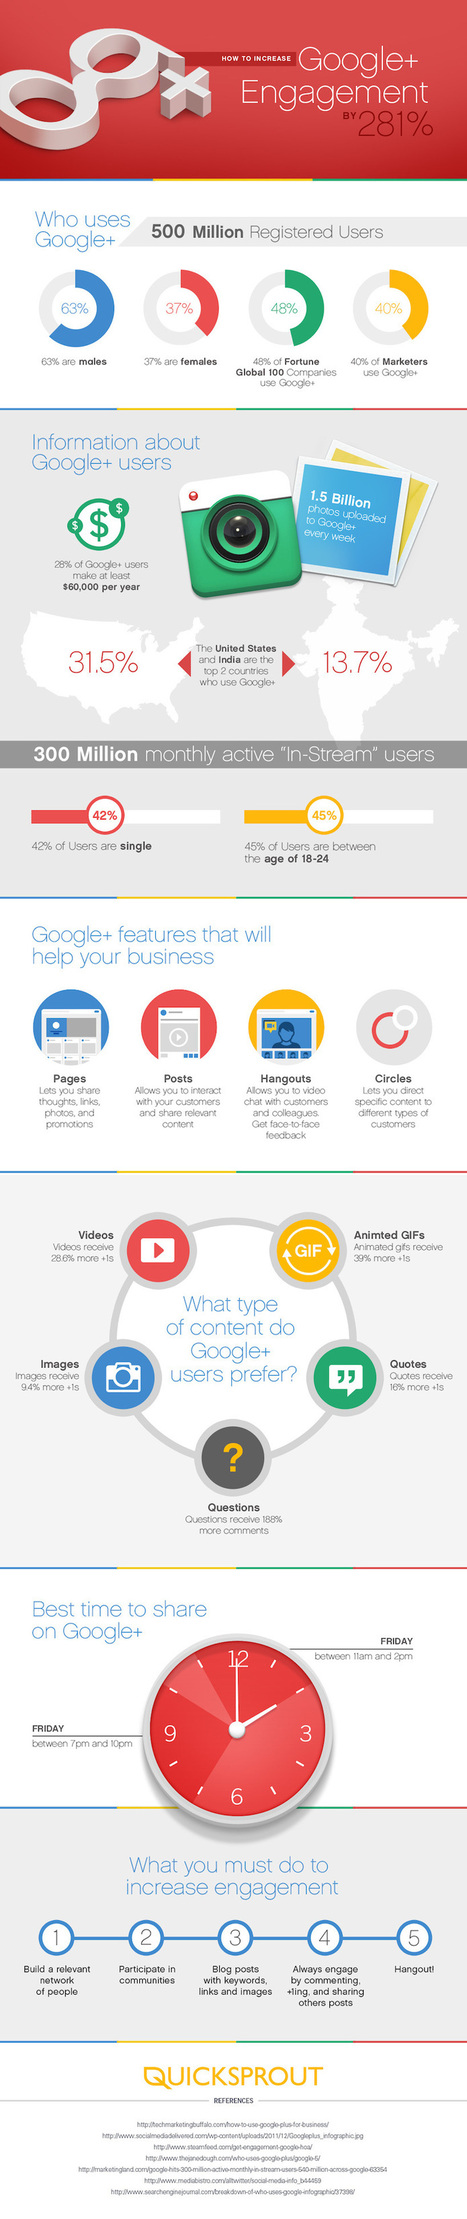 Comment booster les engagements sur Google+ ? Infographie #SMO | SEO | Scoop.it